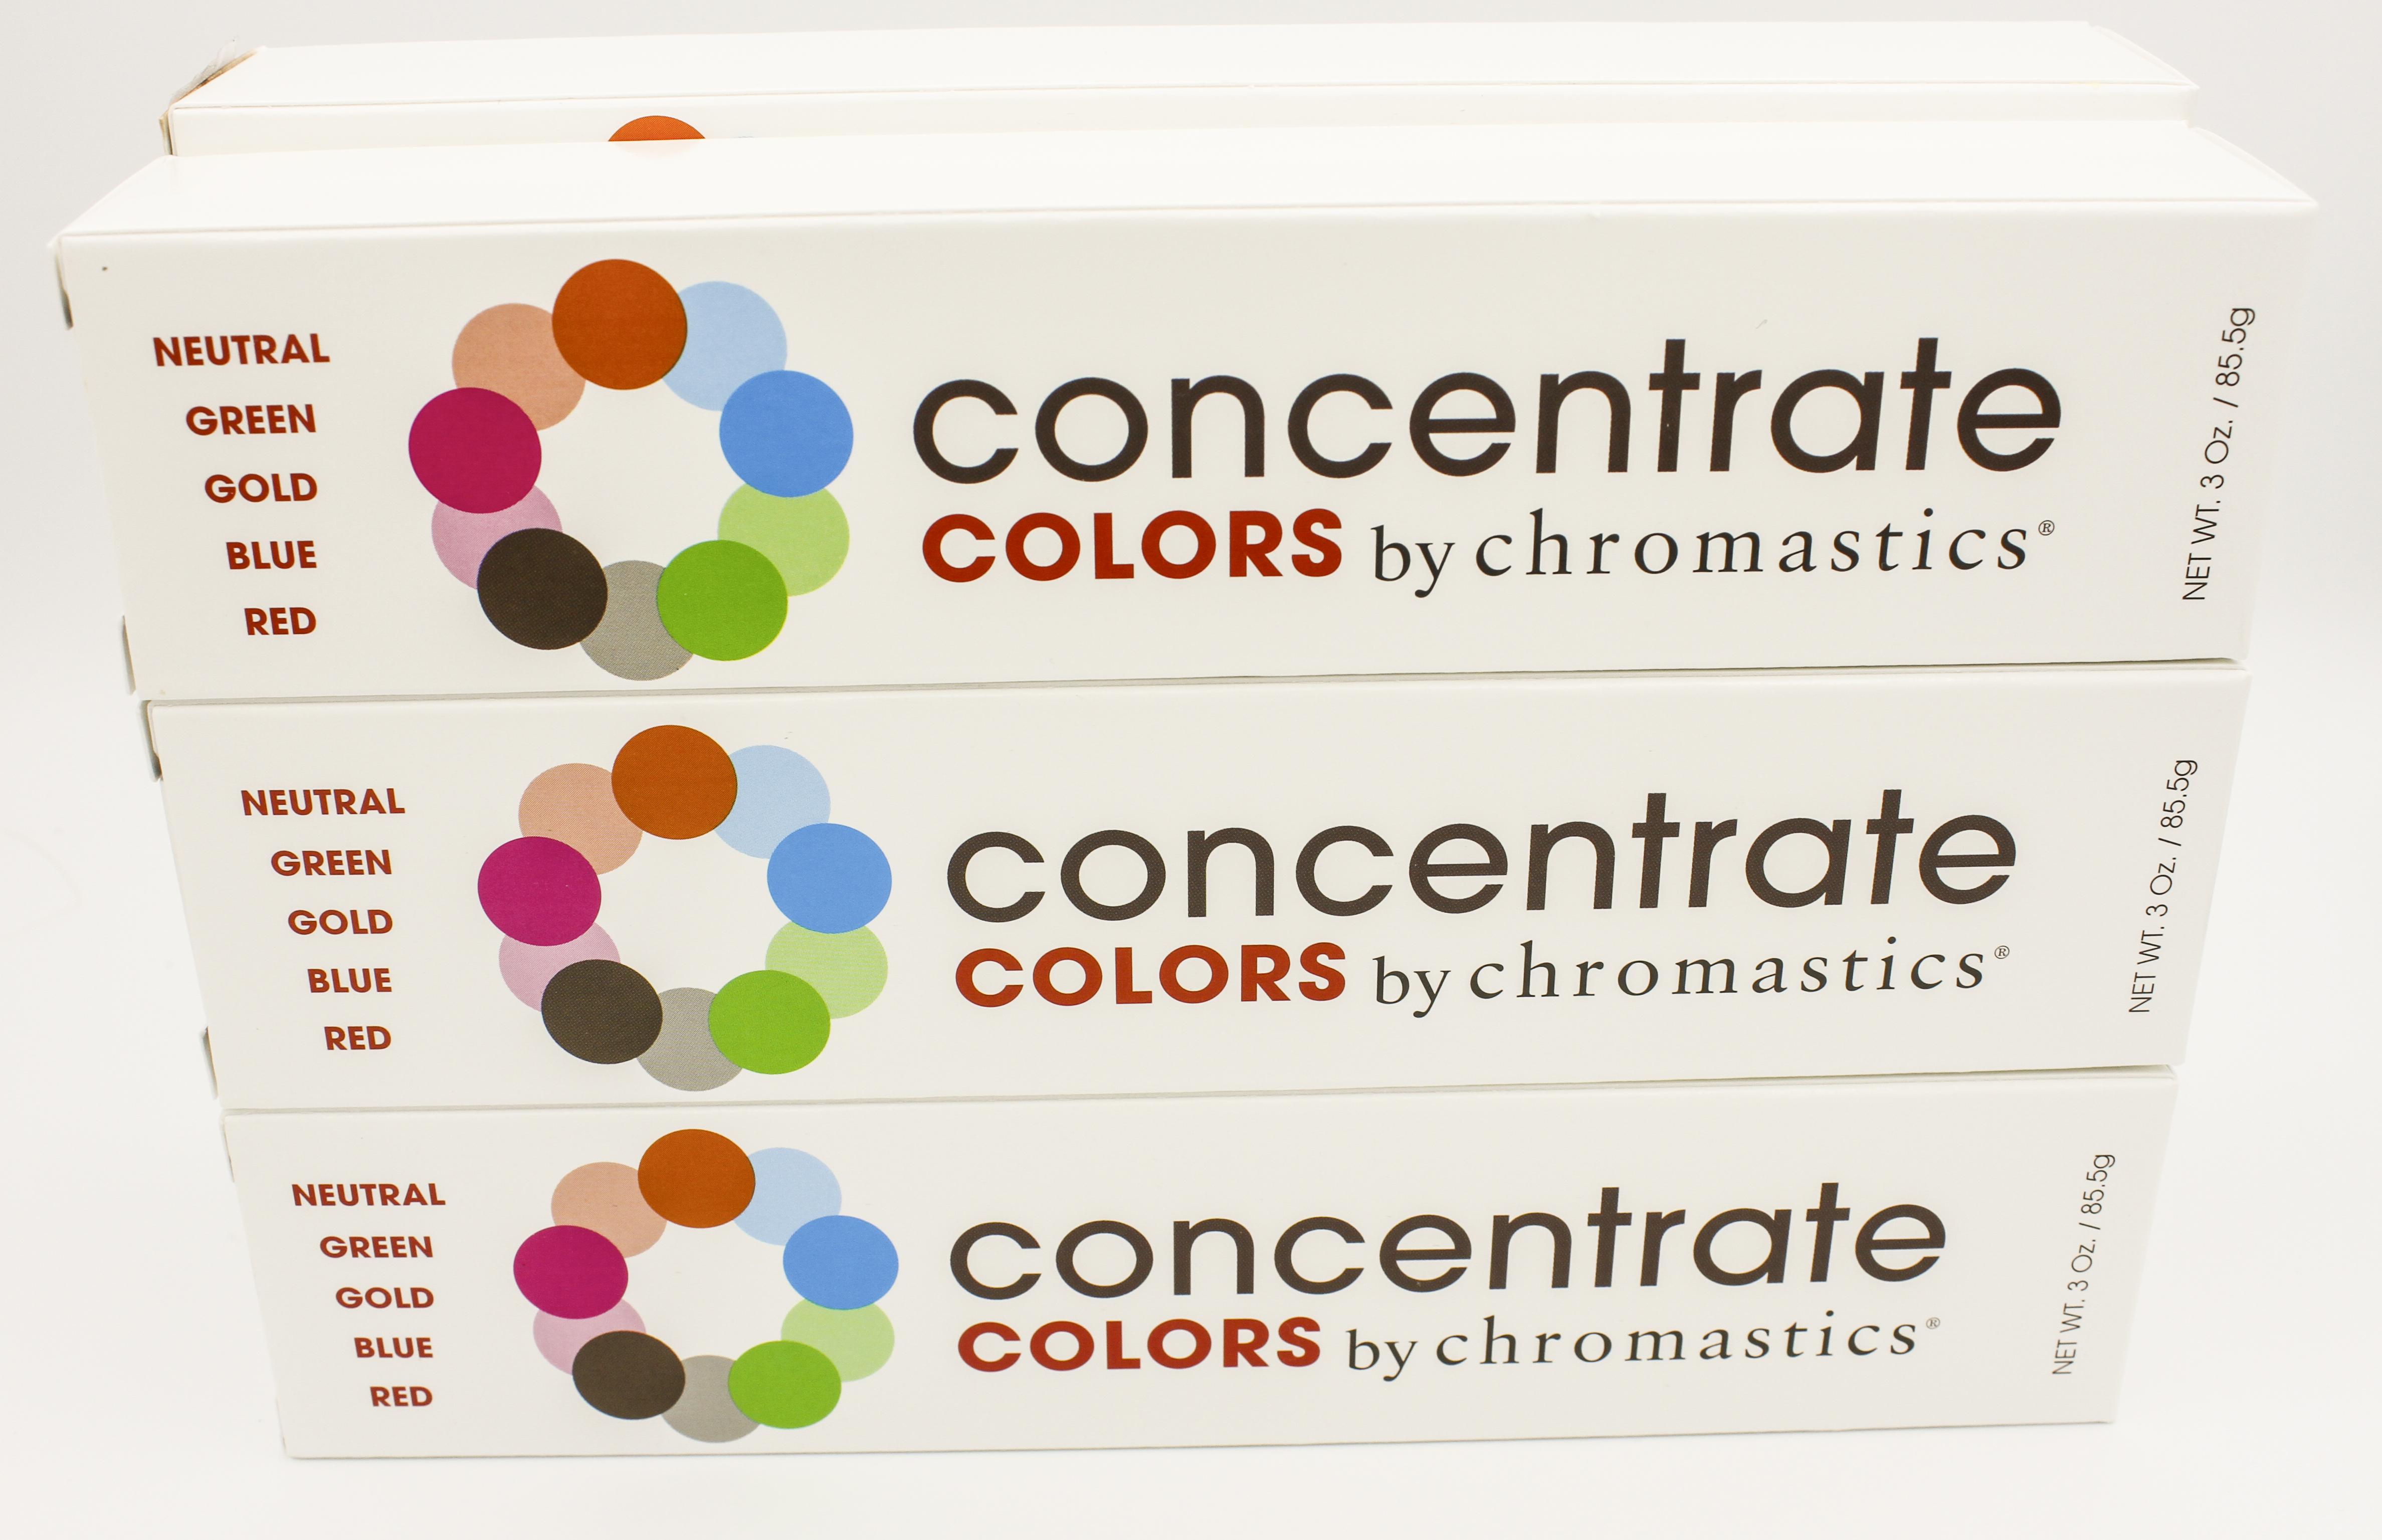 Chromastics Announces Concentrates